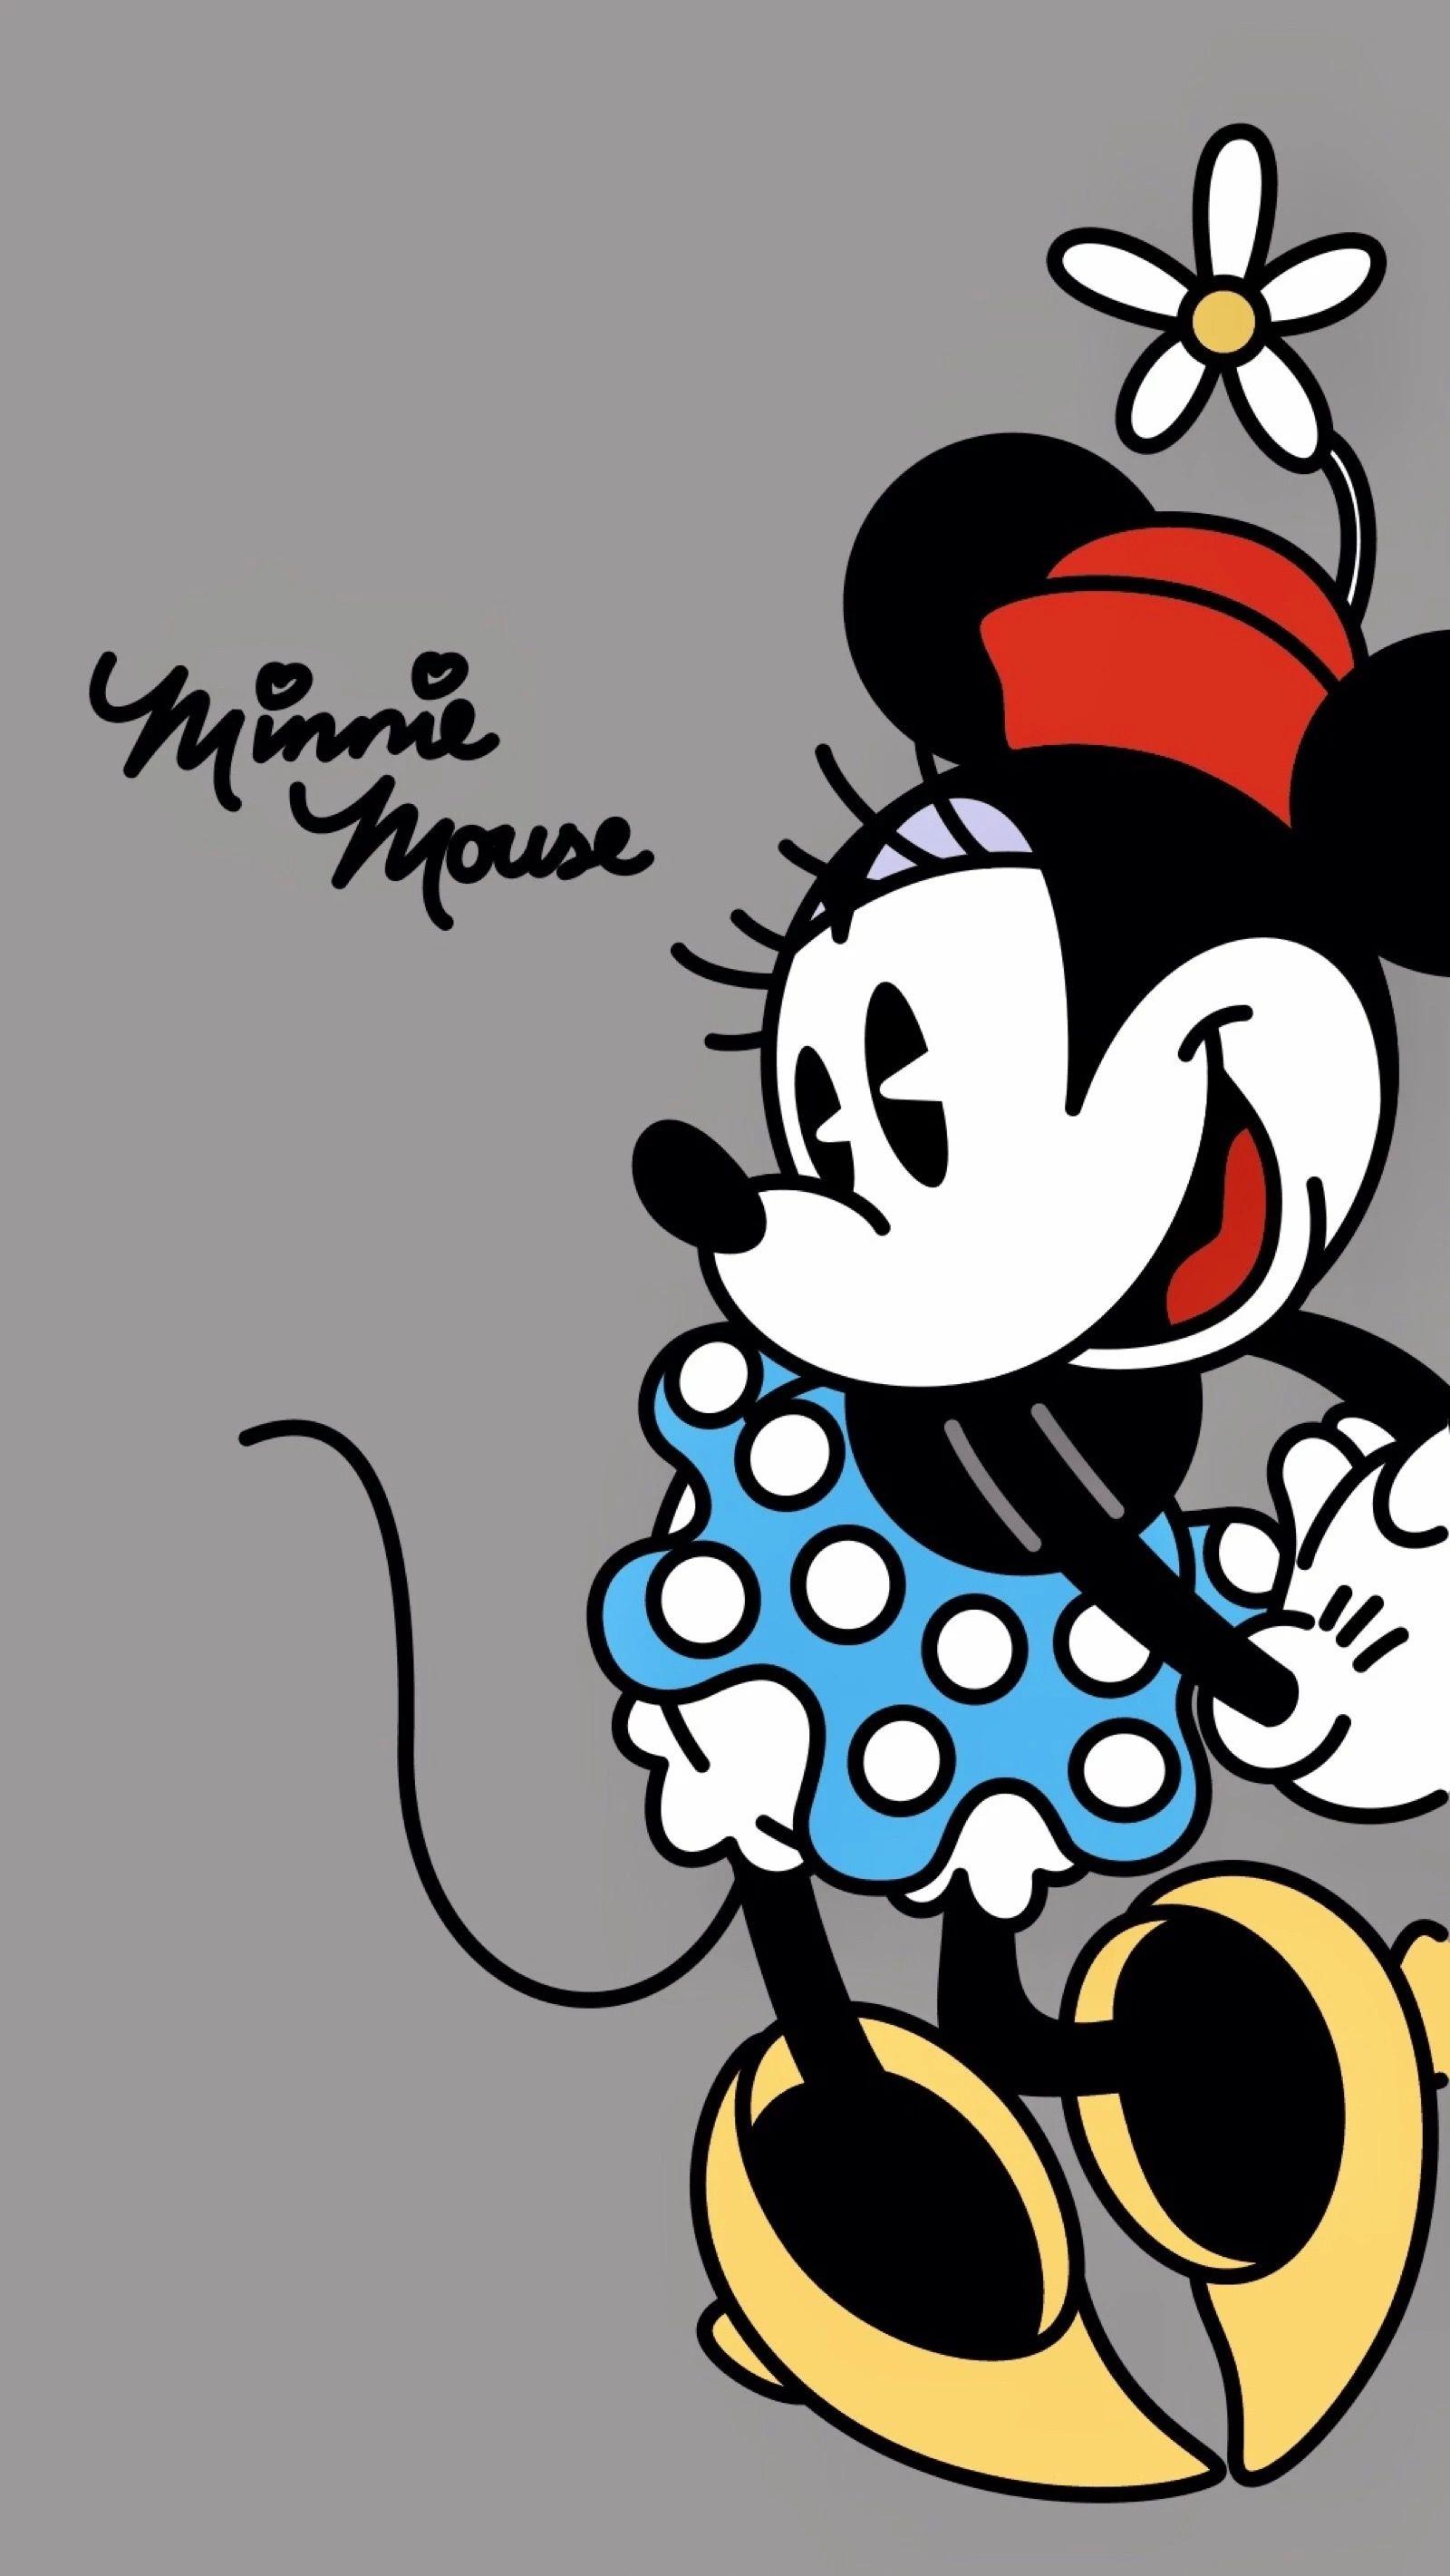 Minnie Mouse Papeis De Parede Engracados Papeis De